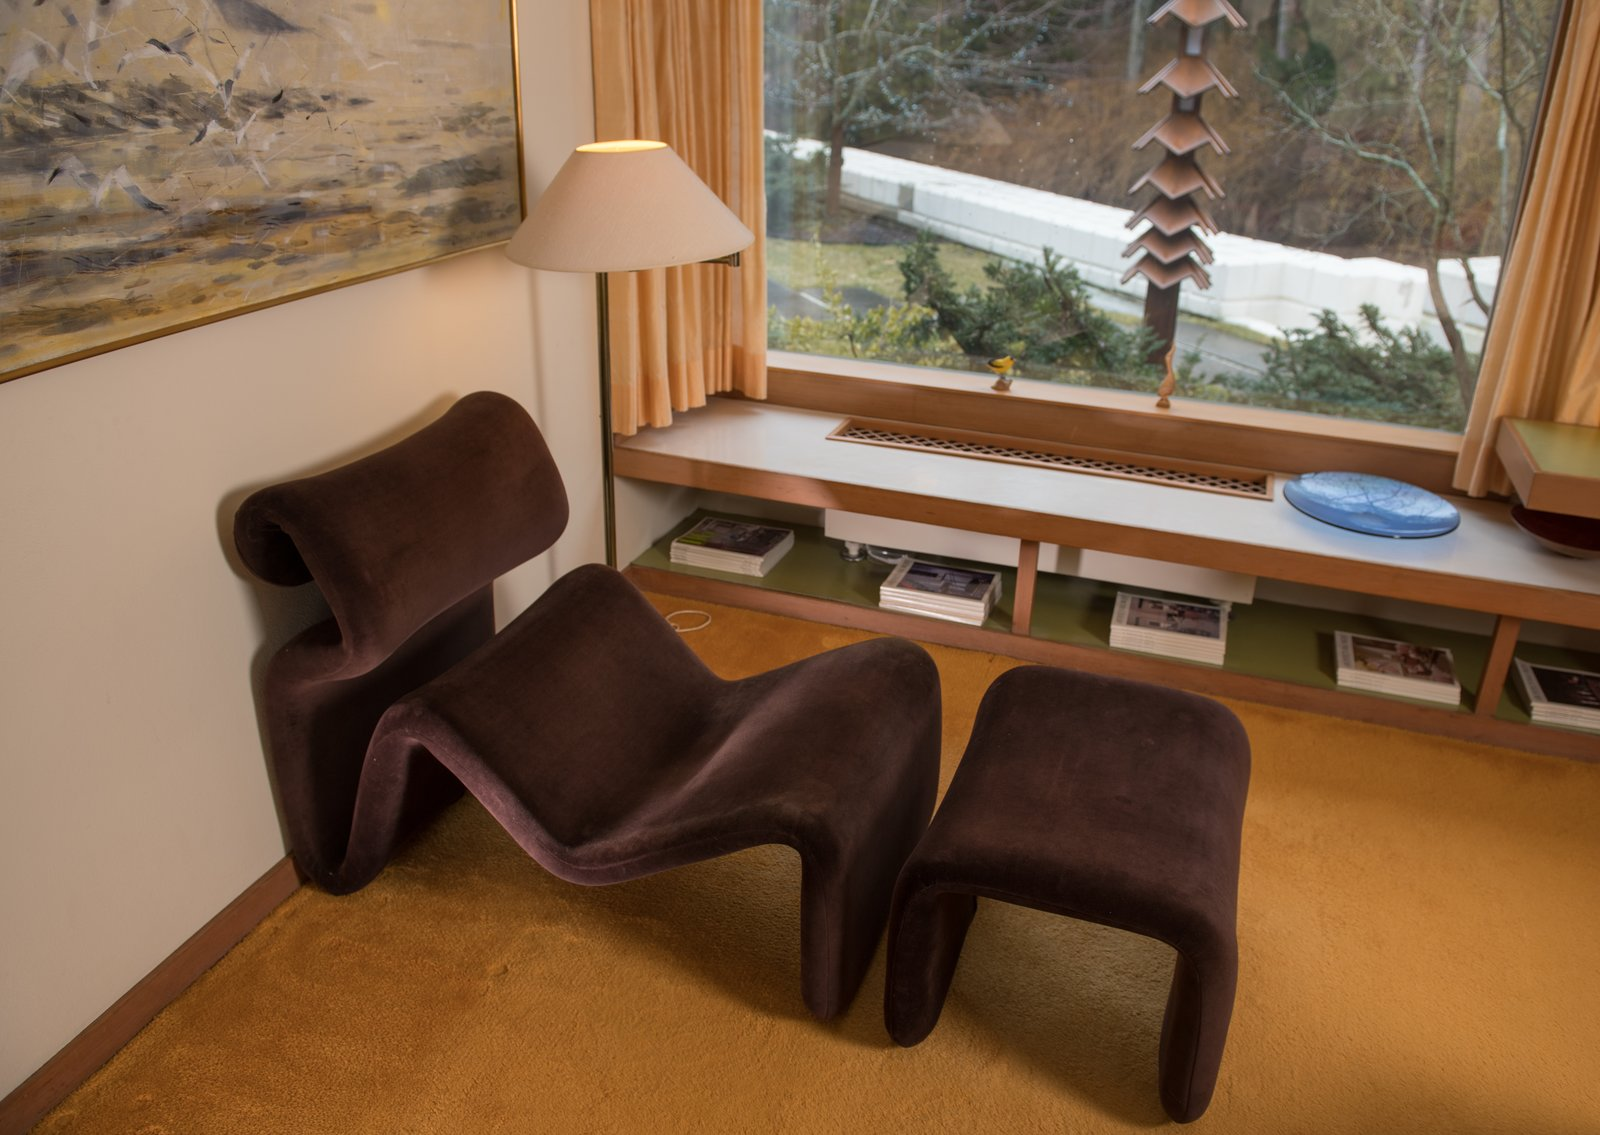 Polyurethane Foam Living Room Chair